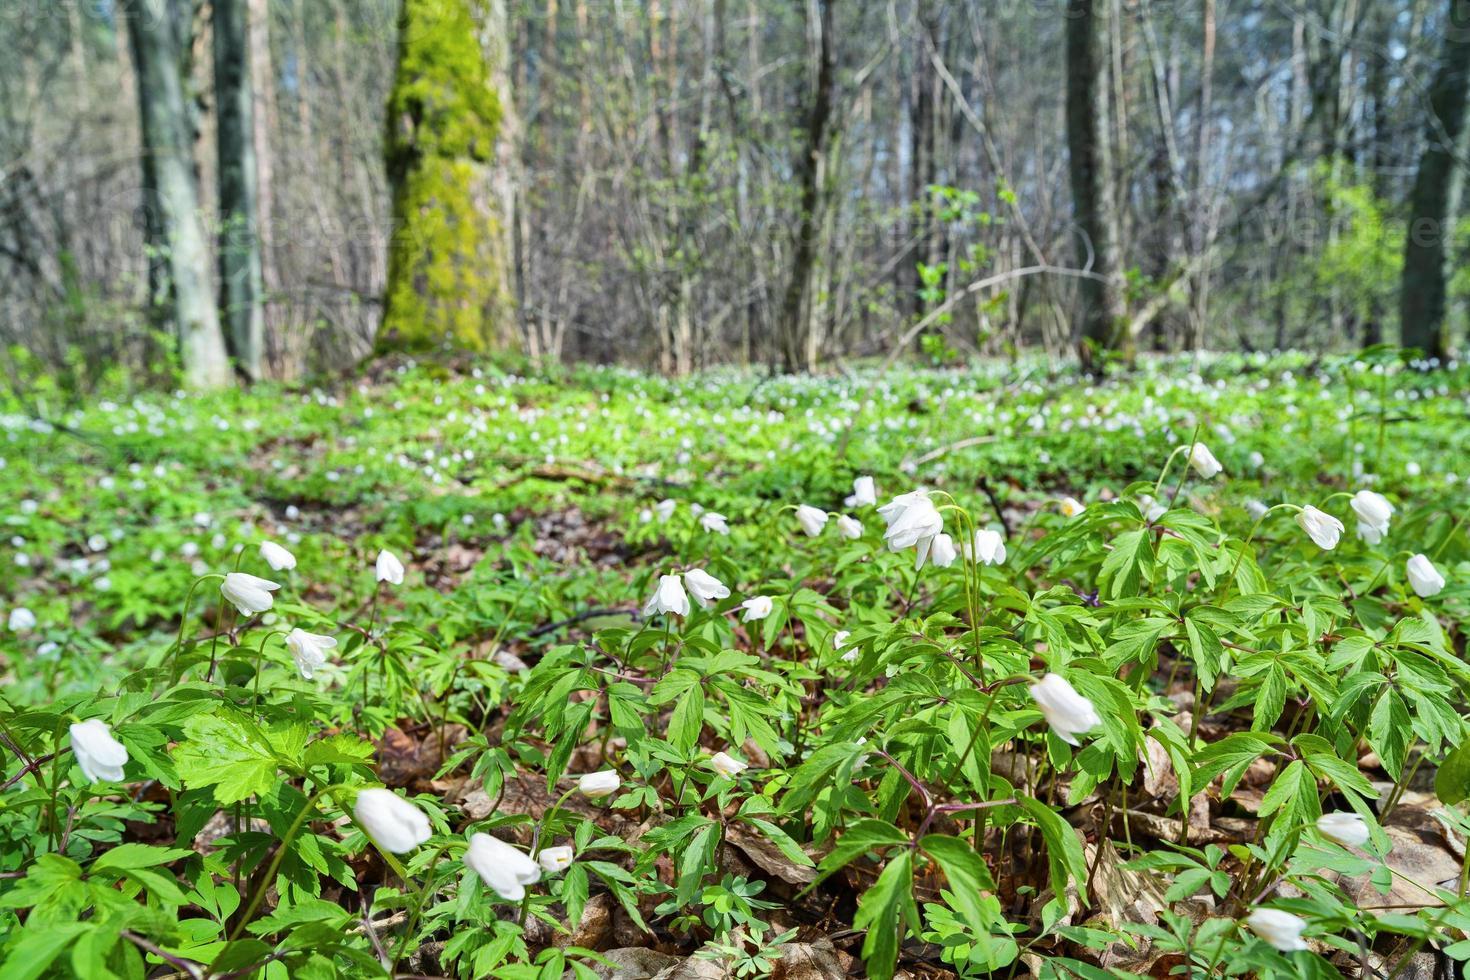 snowdrops na floresta. foto